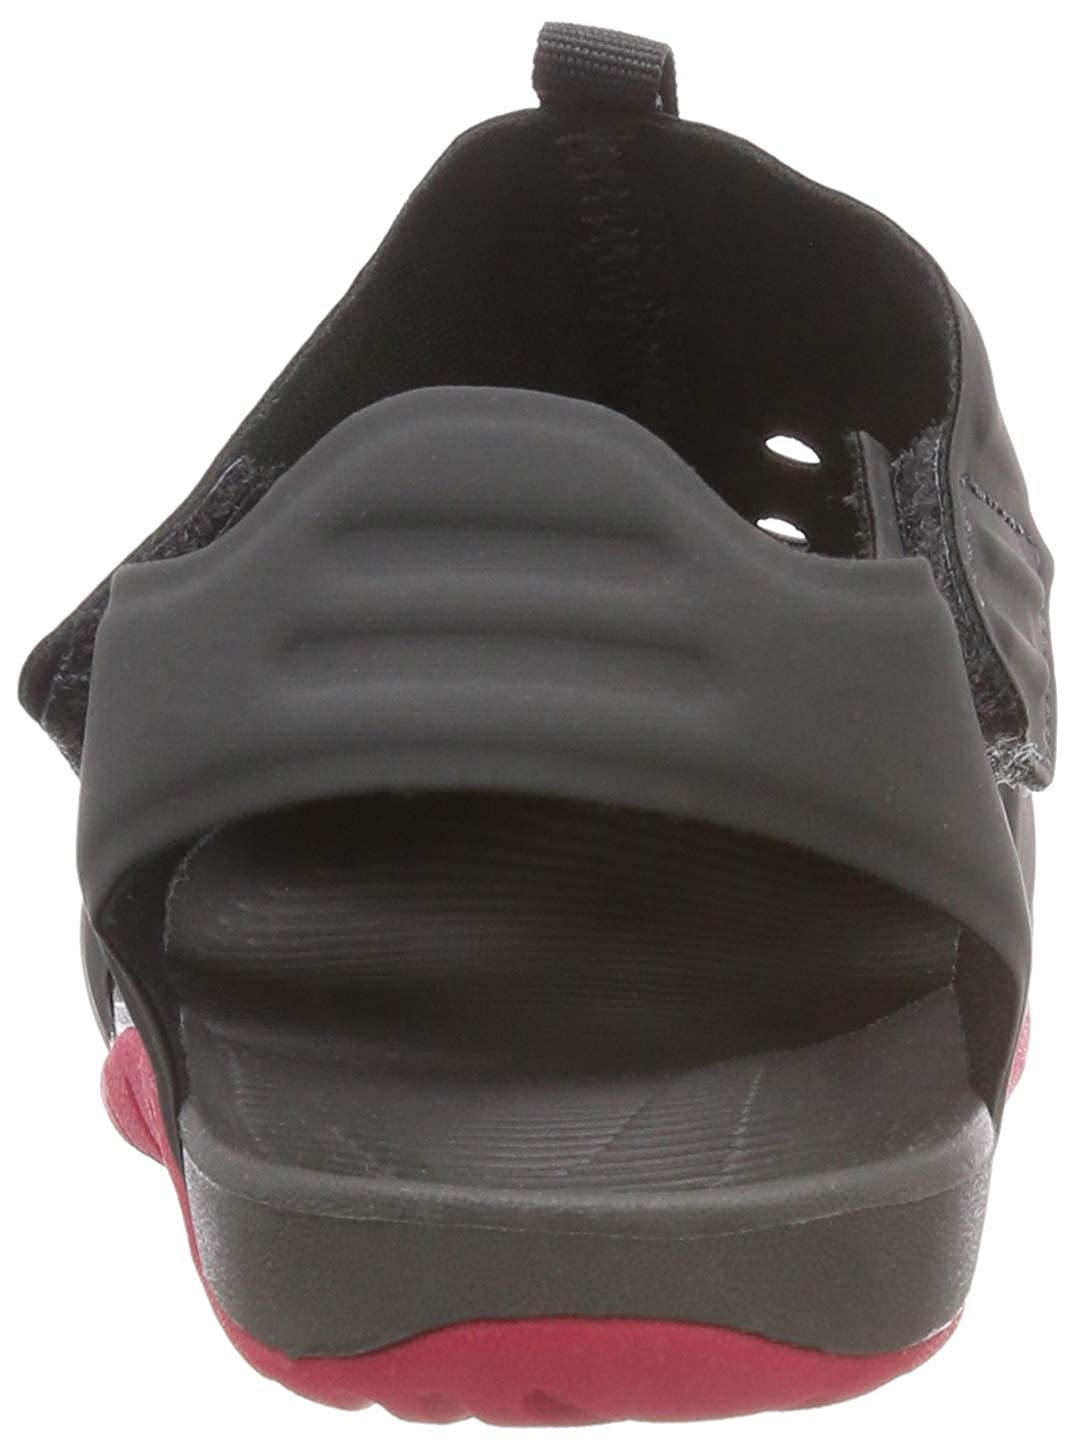 buy online dce02 bbff2 Nike Sunray Protect 2 (PS), Sandales de Sport Fille